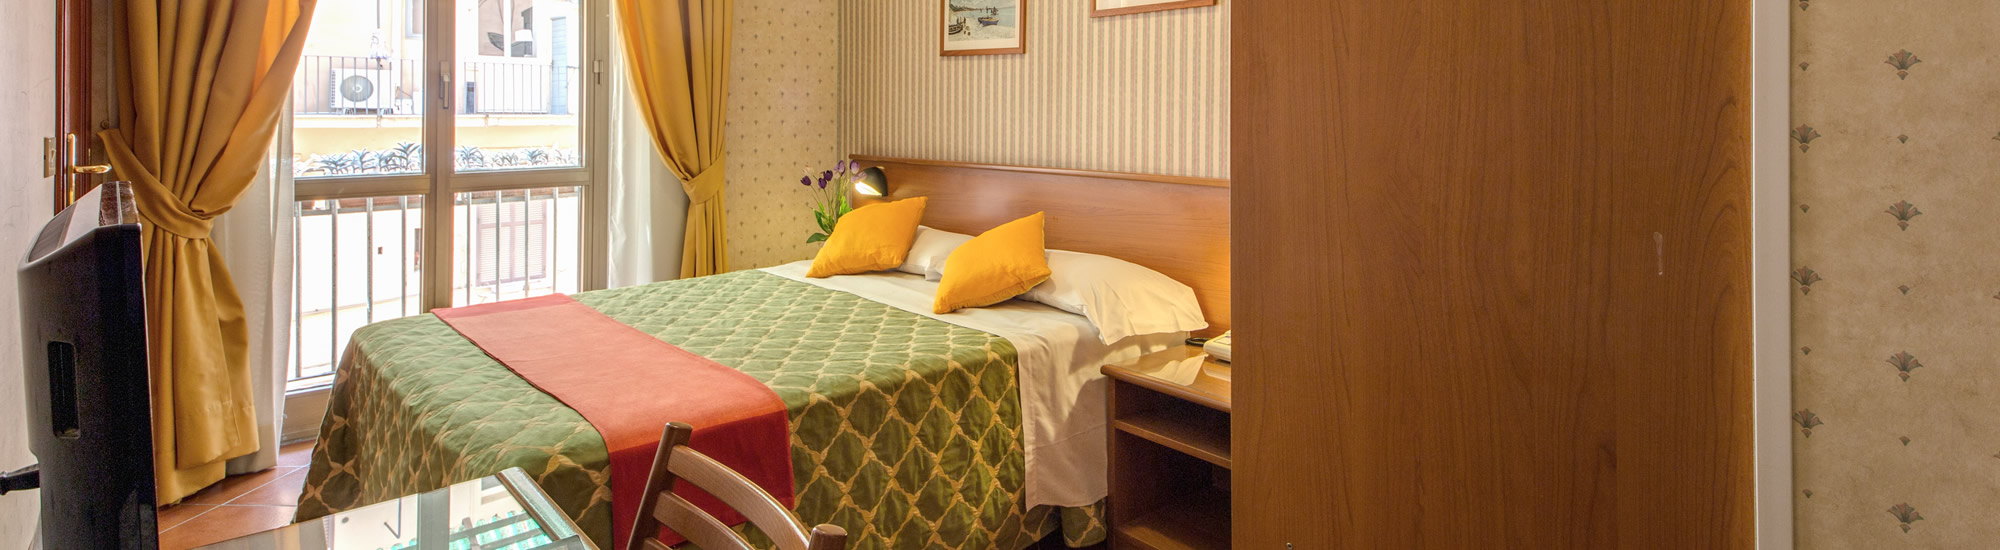 Corona Hotel Roma - Sitio Oficial - Hotel 3